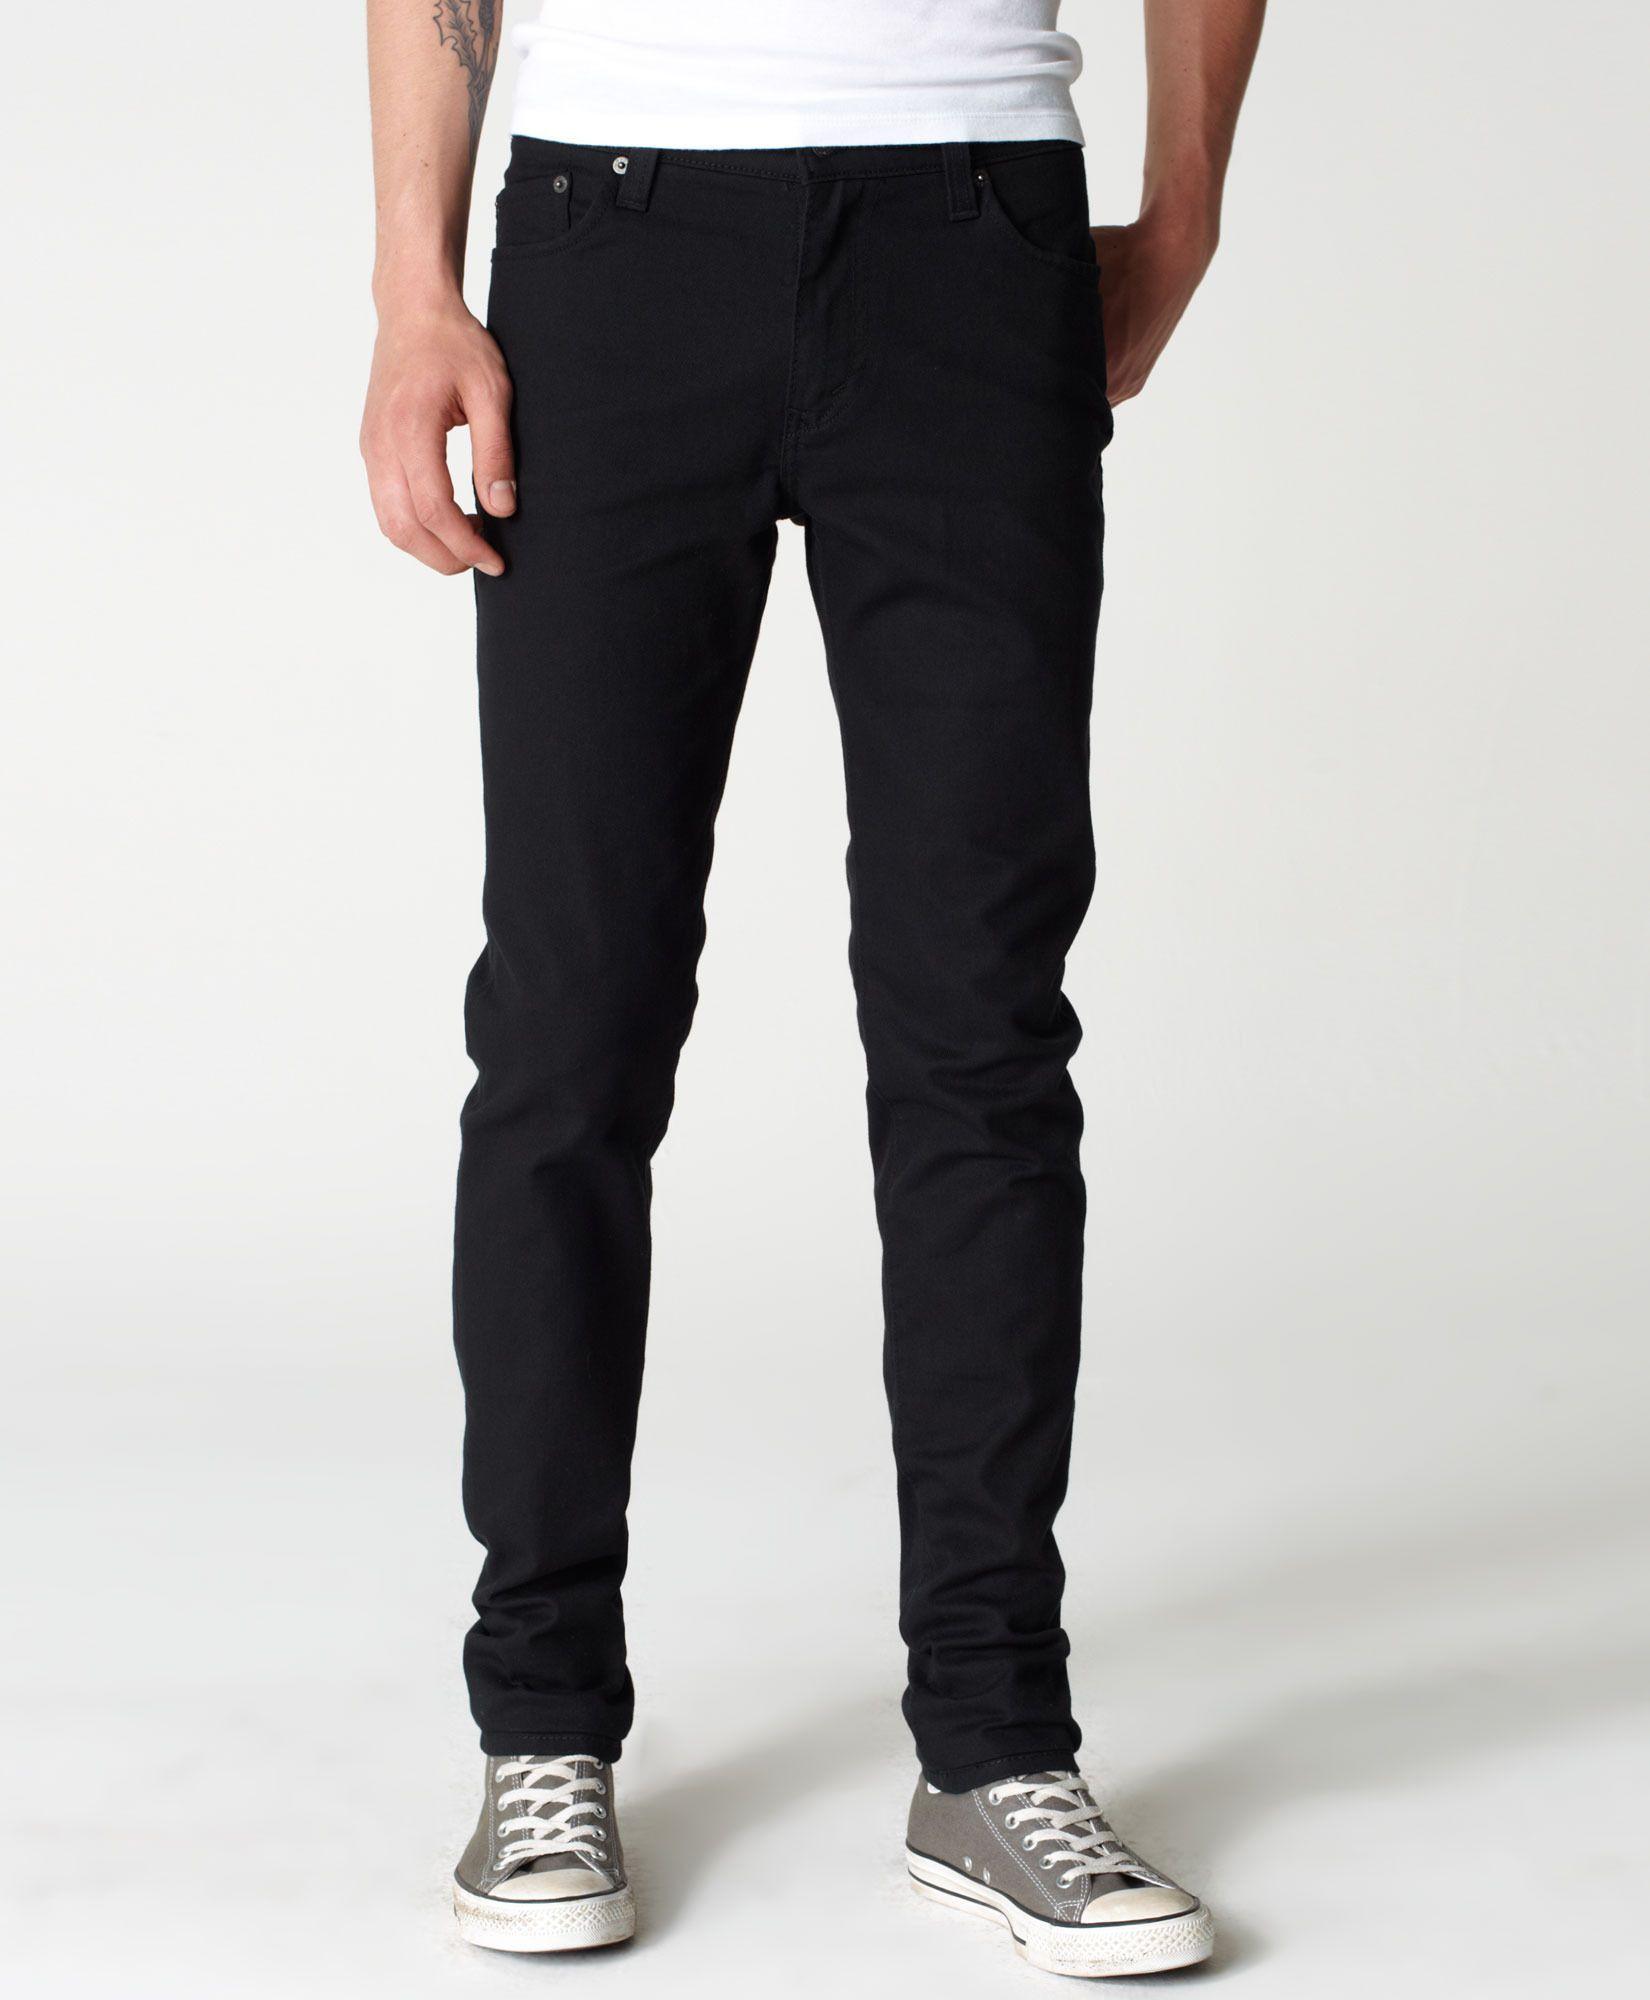 510 skinny fit mens jeans in 2020 black jeans men